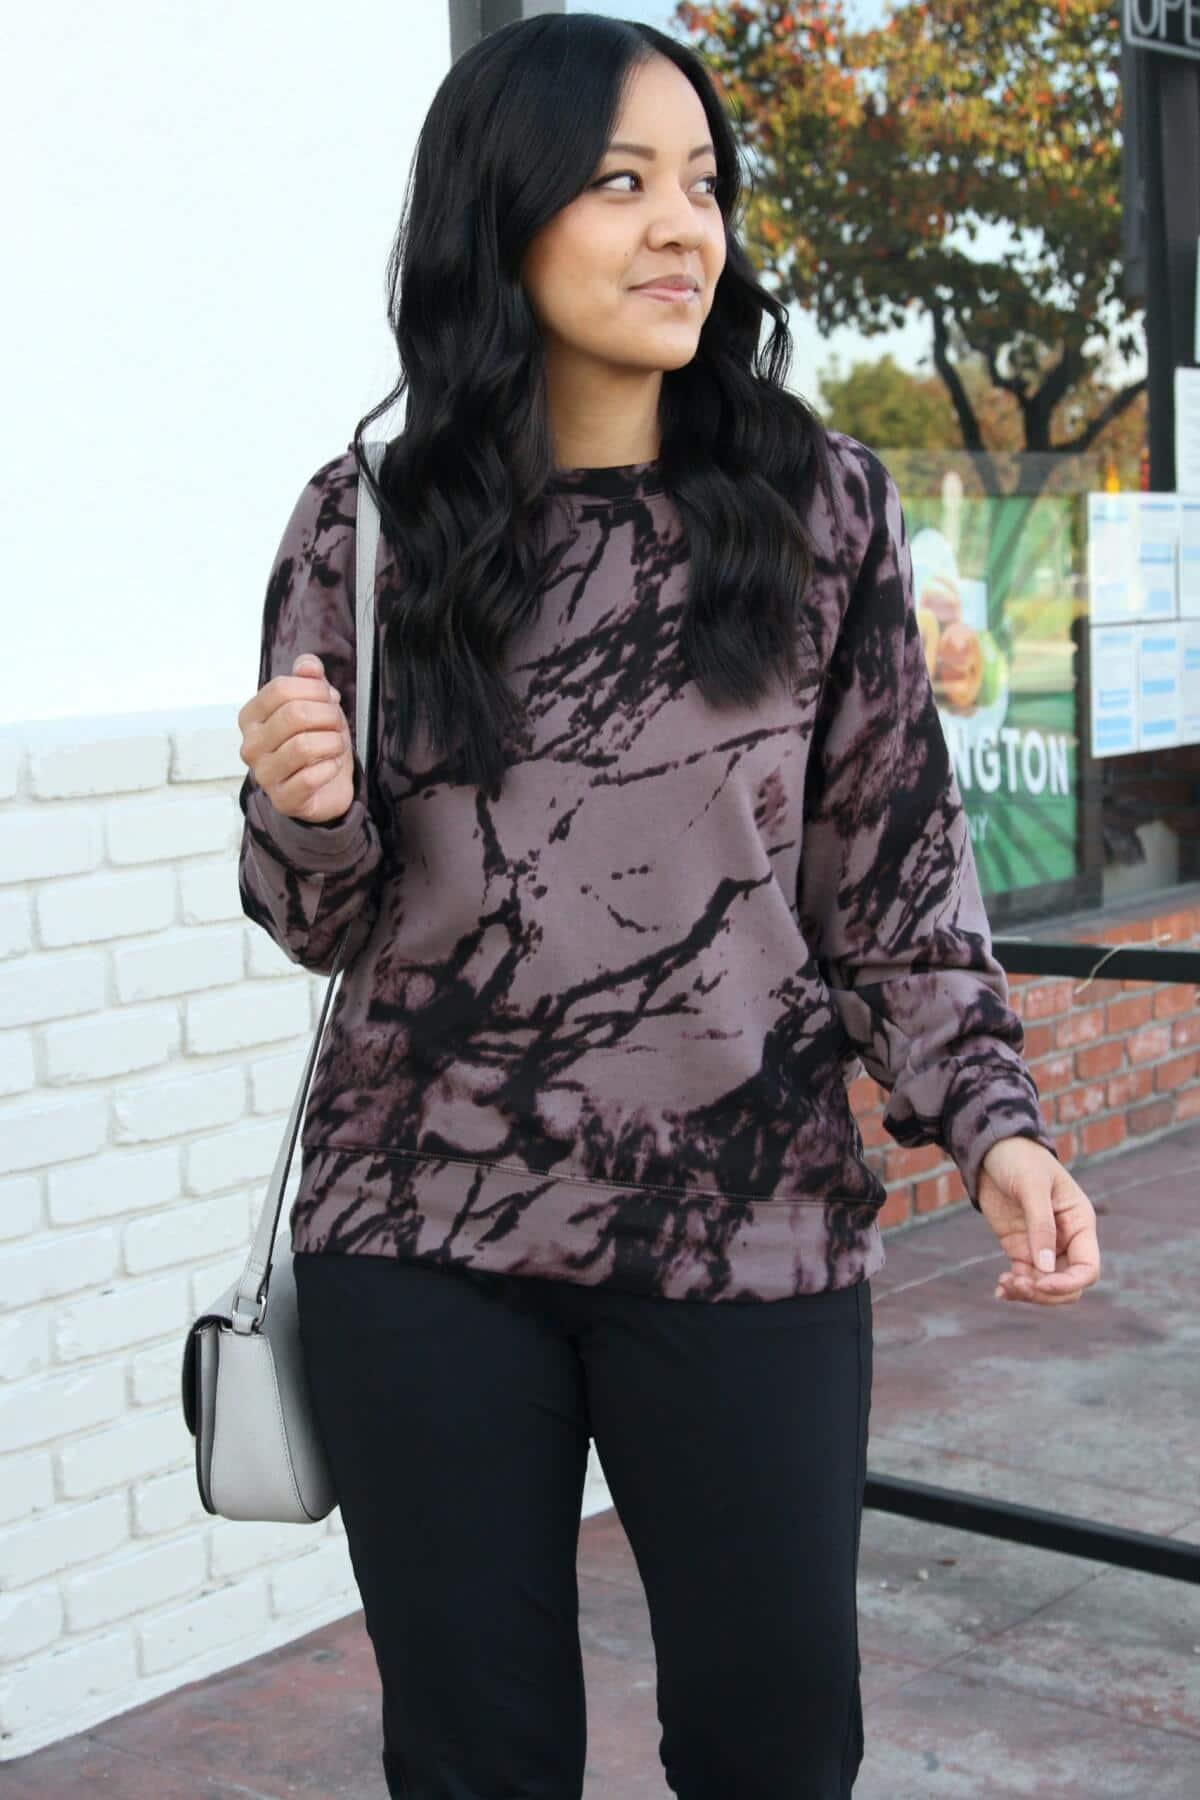 Winter Athleisure Outfit: purple and black splattered sweatshirt + black joggers + grey crossbody bag